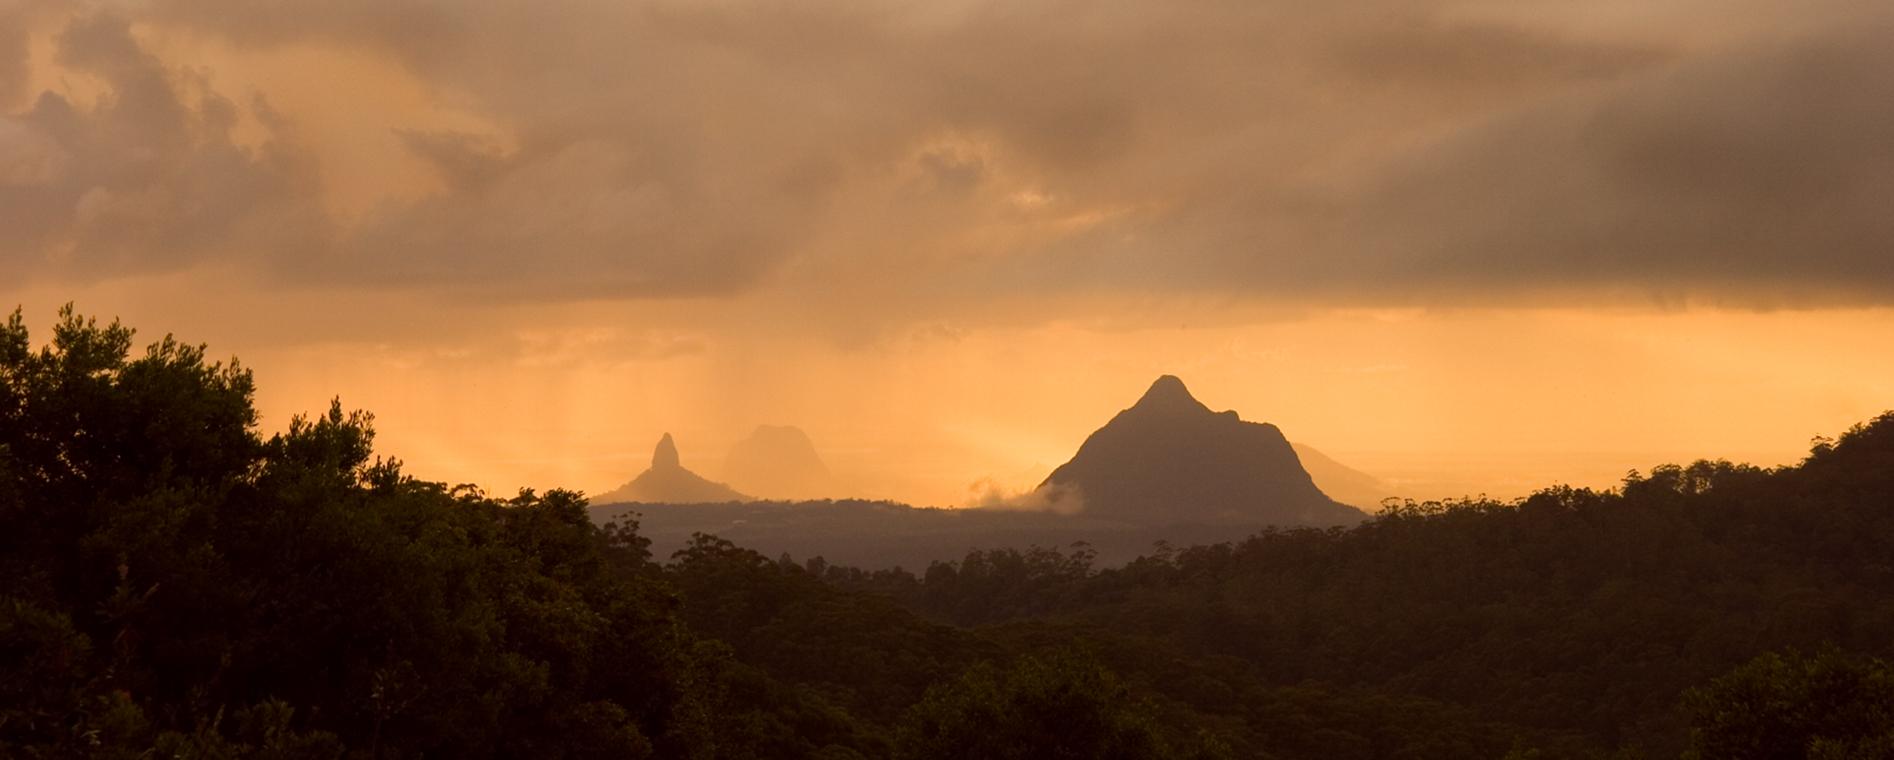 A Glasshouse Mountains sunrise Penny Riddoch.jpg